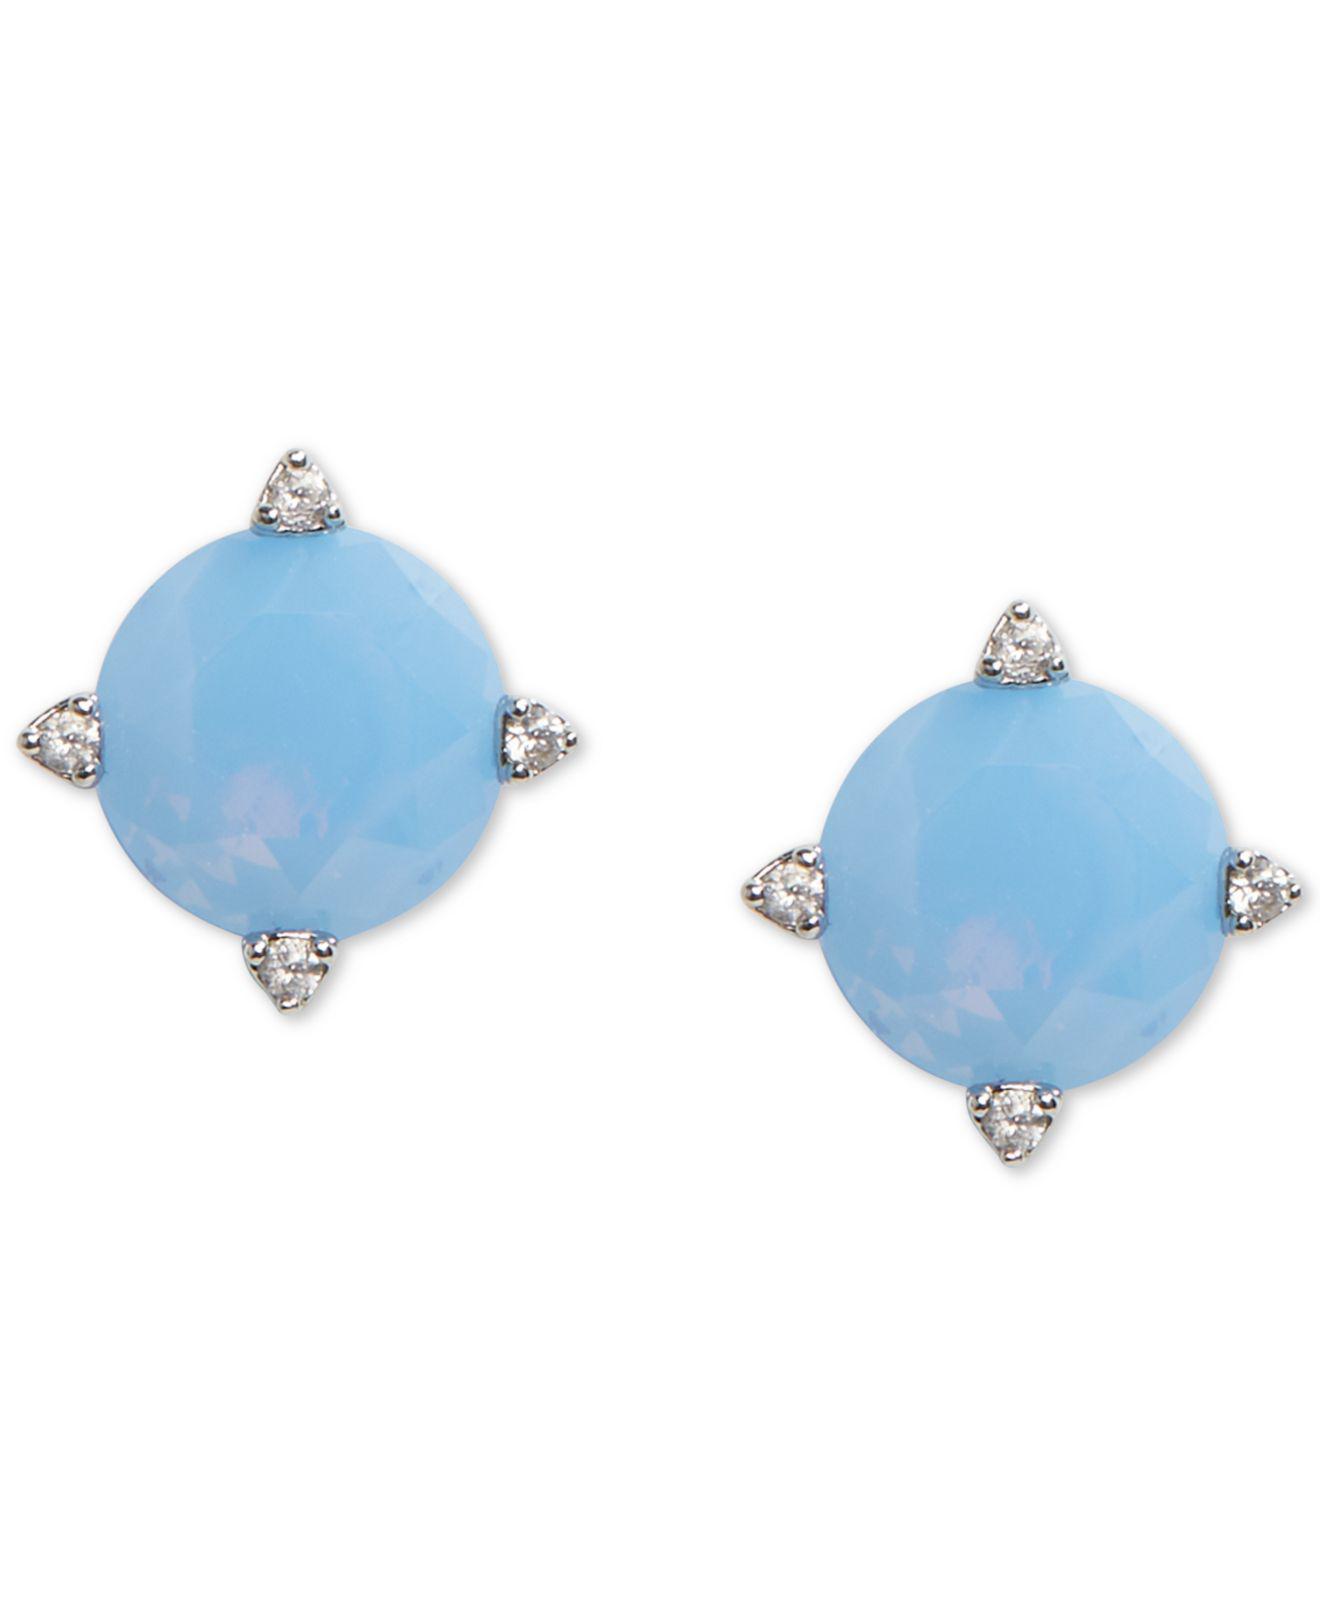 e20337f458e7e Vera Bradley Sparkling Stud Earrings in Blue - Lyst